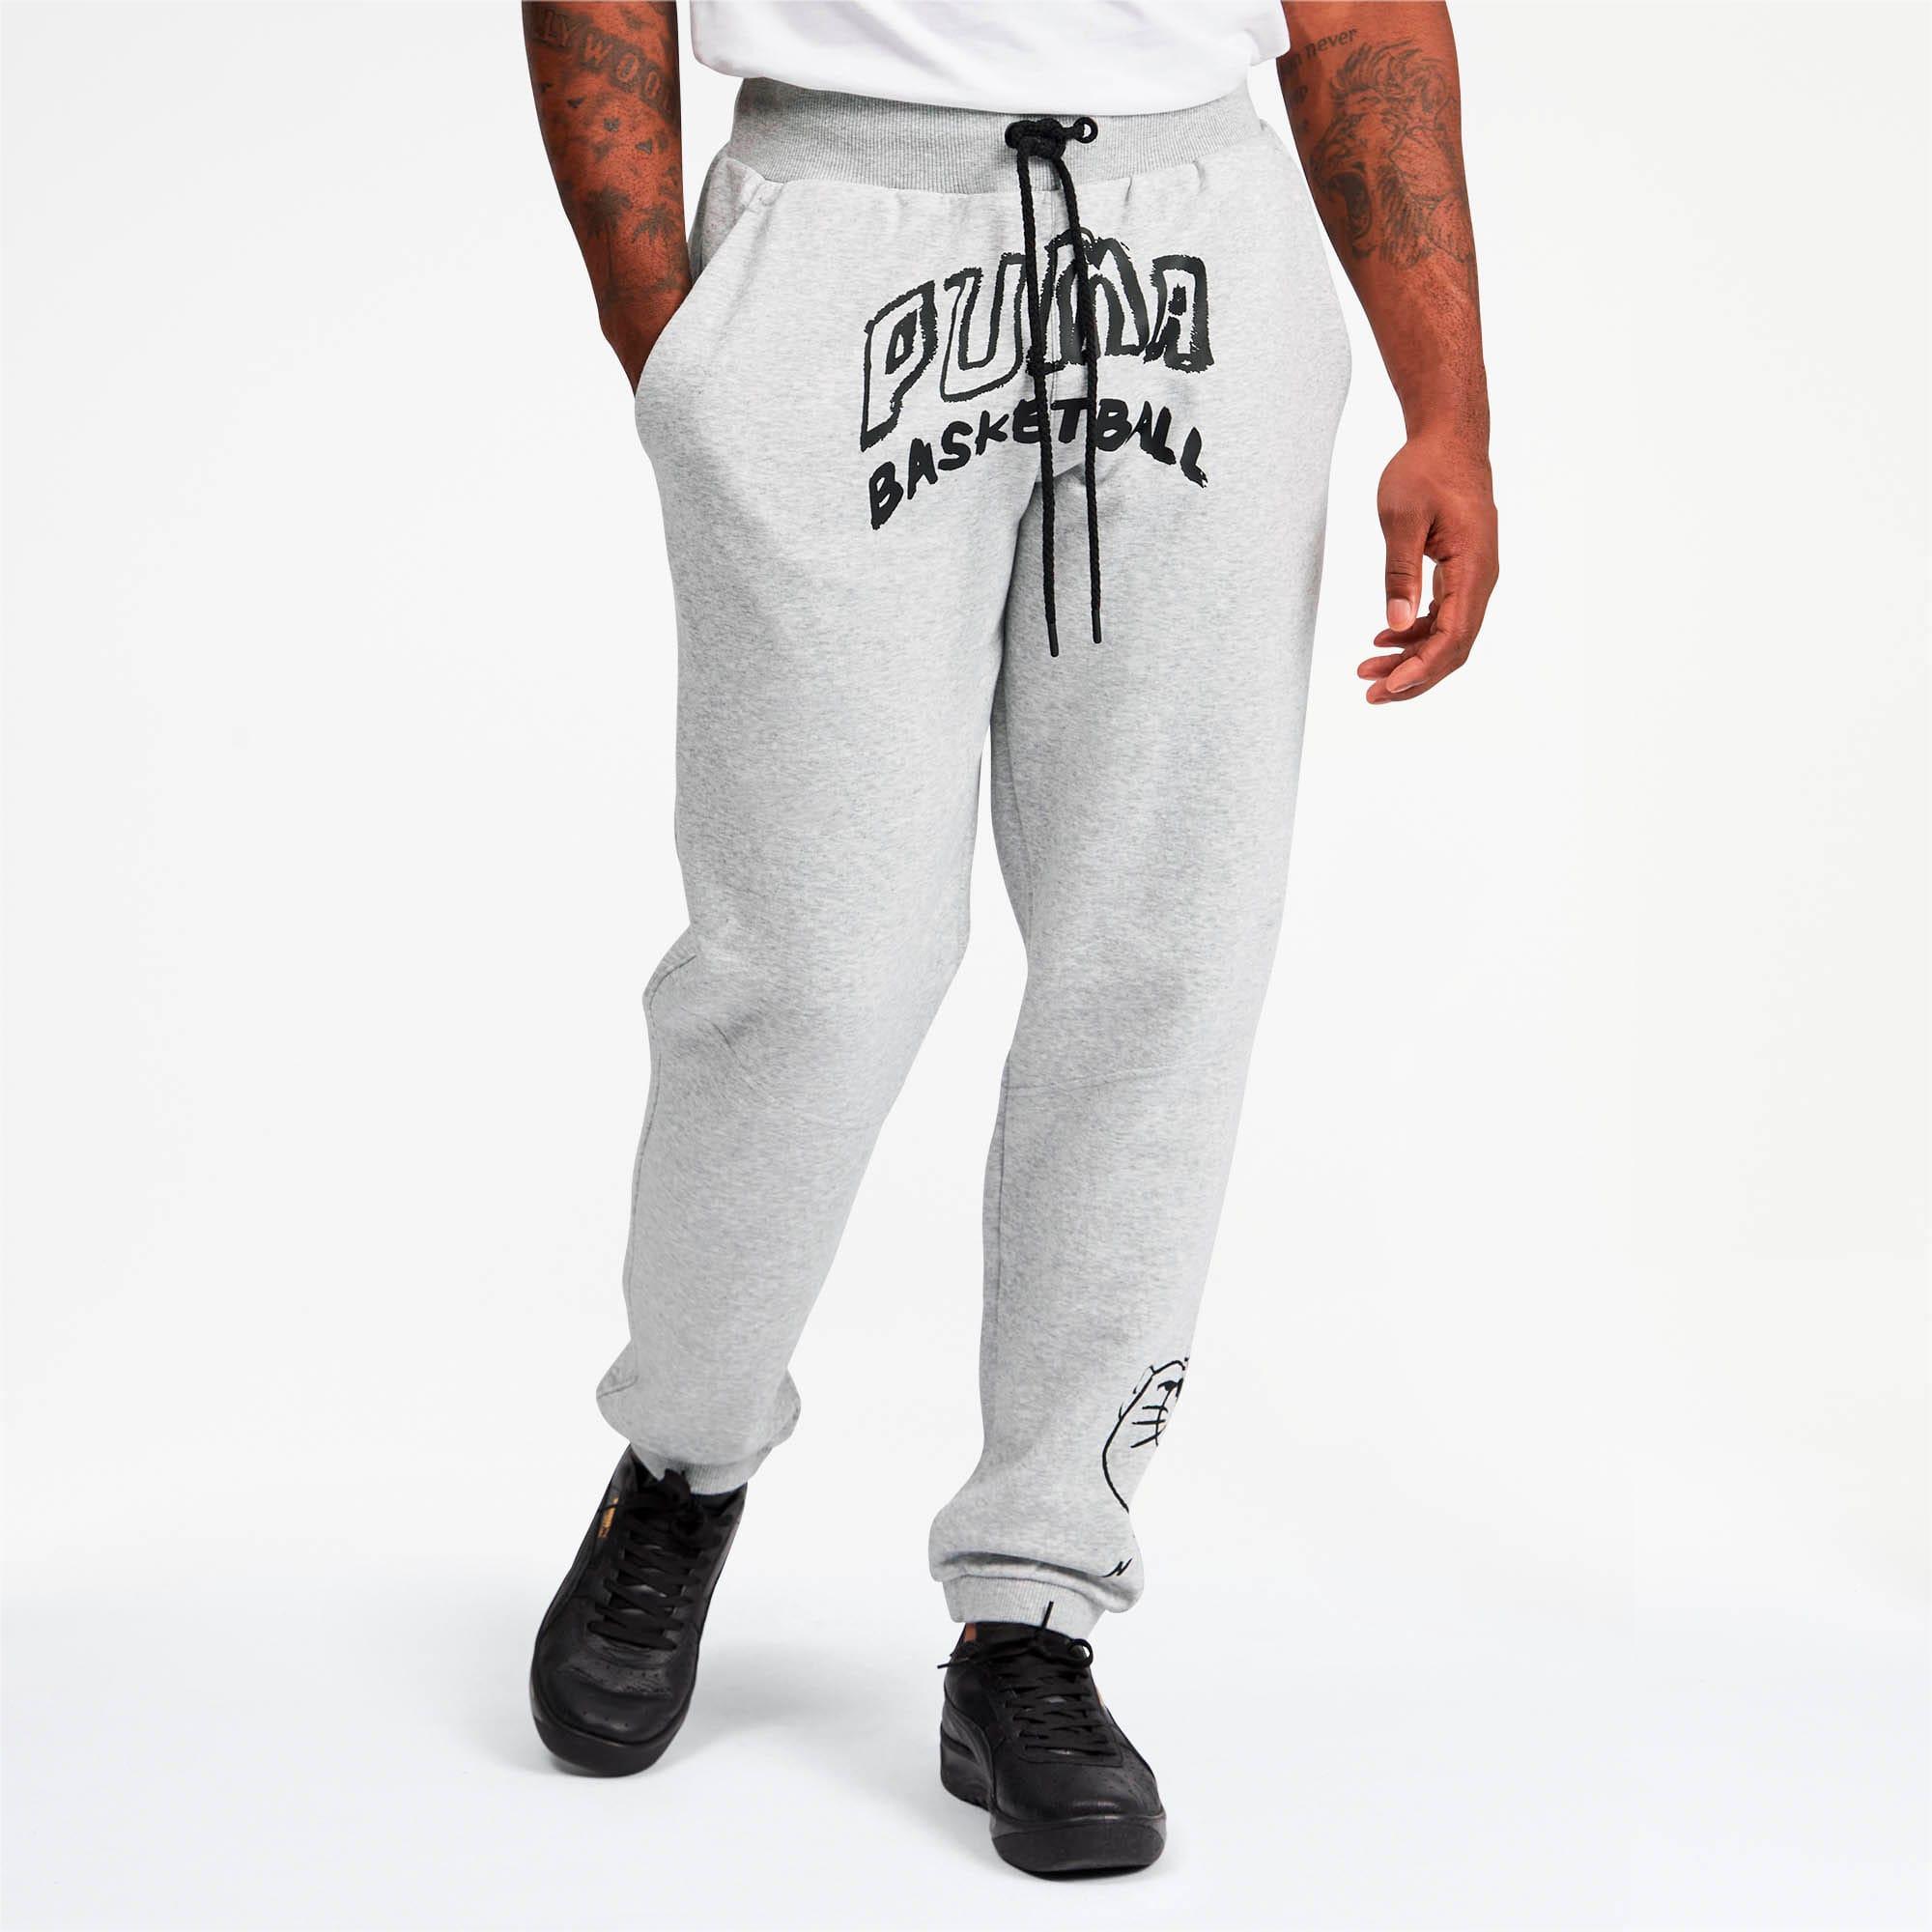 Pantalones Deportivos Court Para Hombre Puma Ee Uu